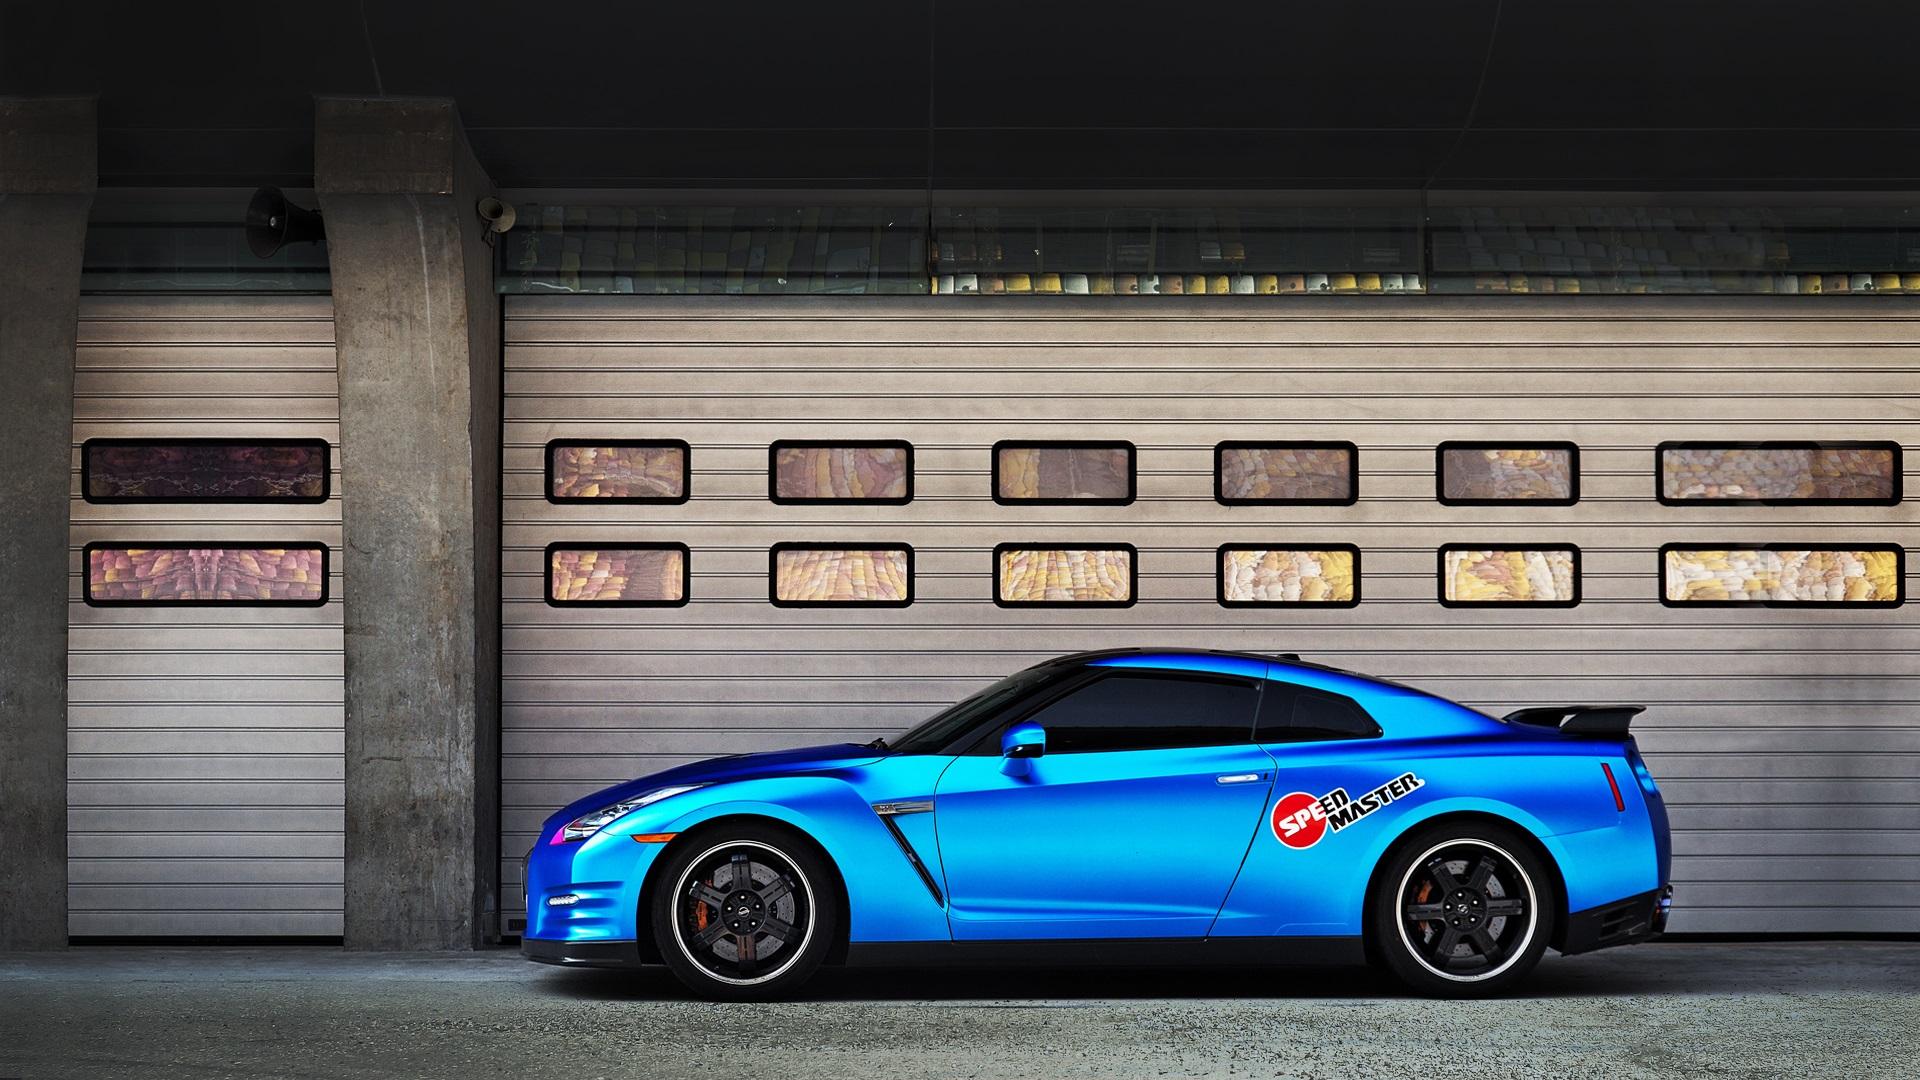 Wallpaper Nissan Gt R Blue Car Side View 1920x1080 Full Hd 2k